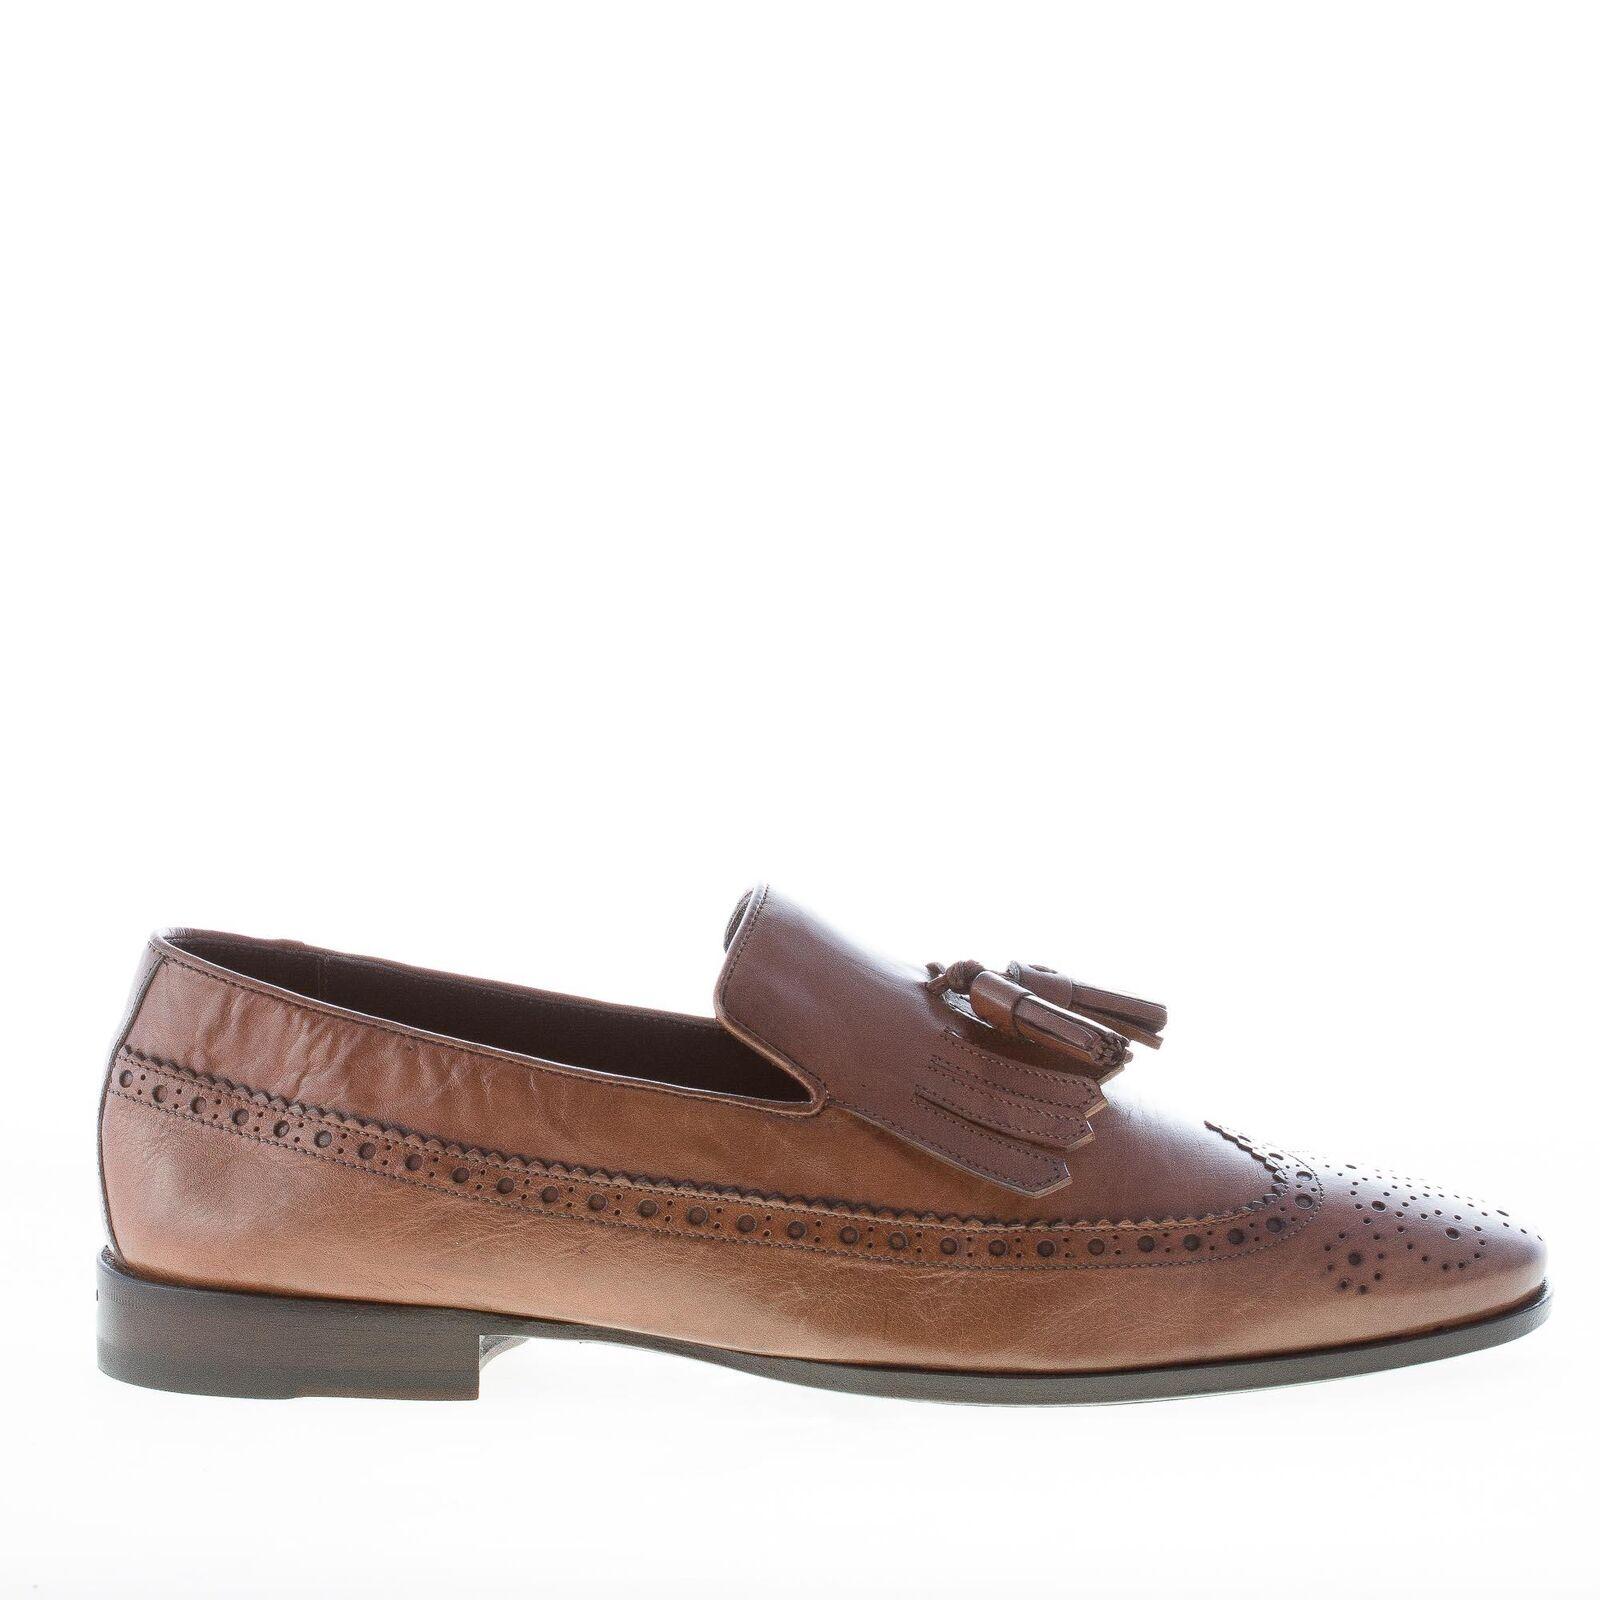 ORTIGNI scarpe uomo Uomo shoes Mocassino pelle naturale taupe frangia nappine